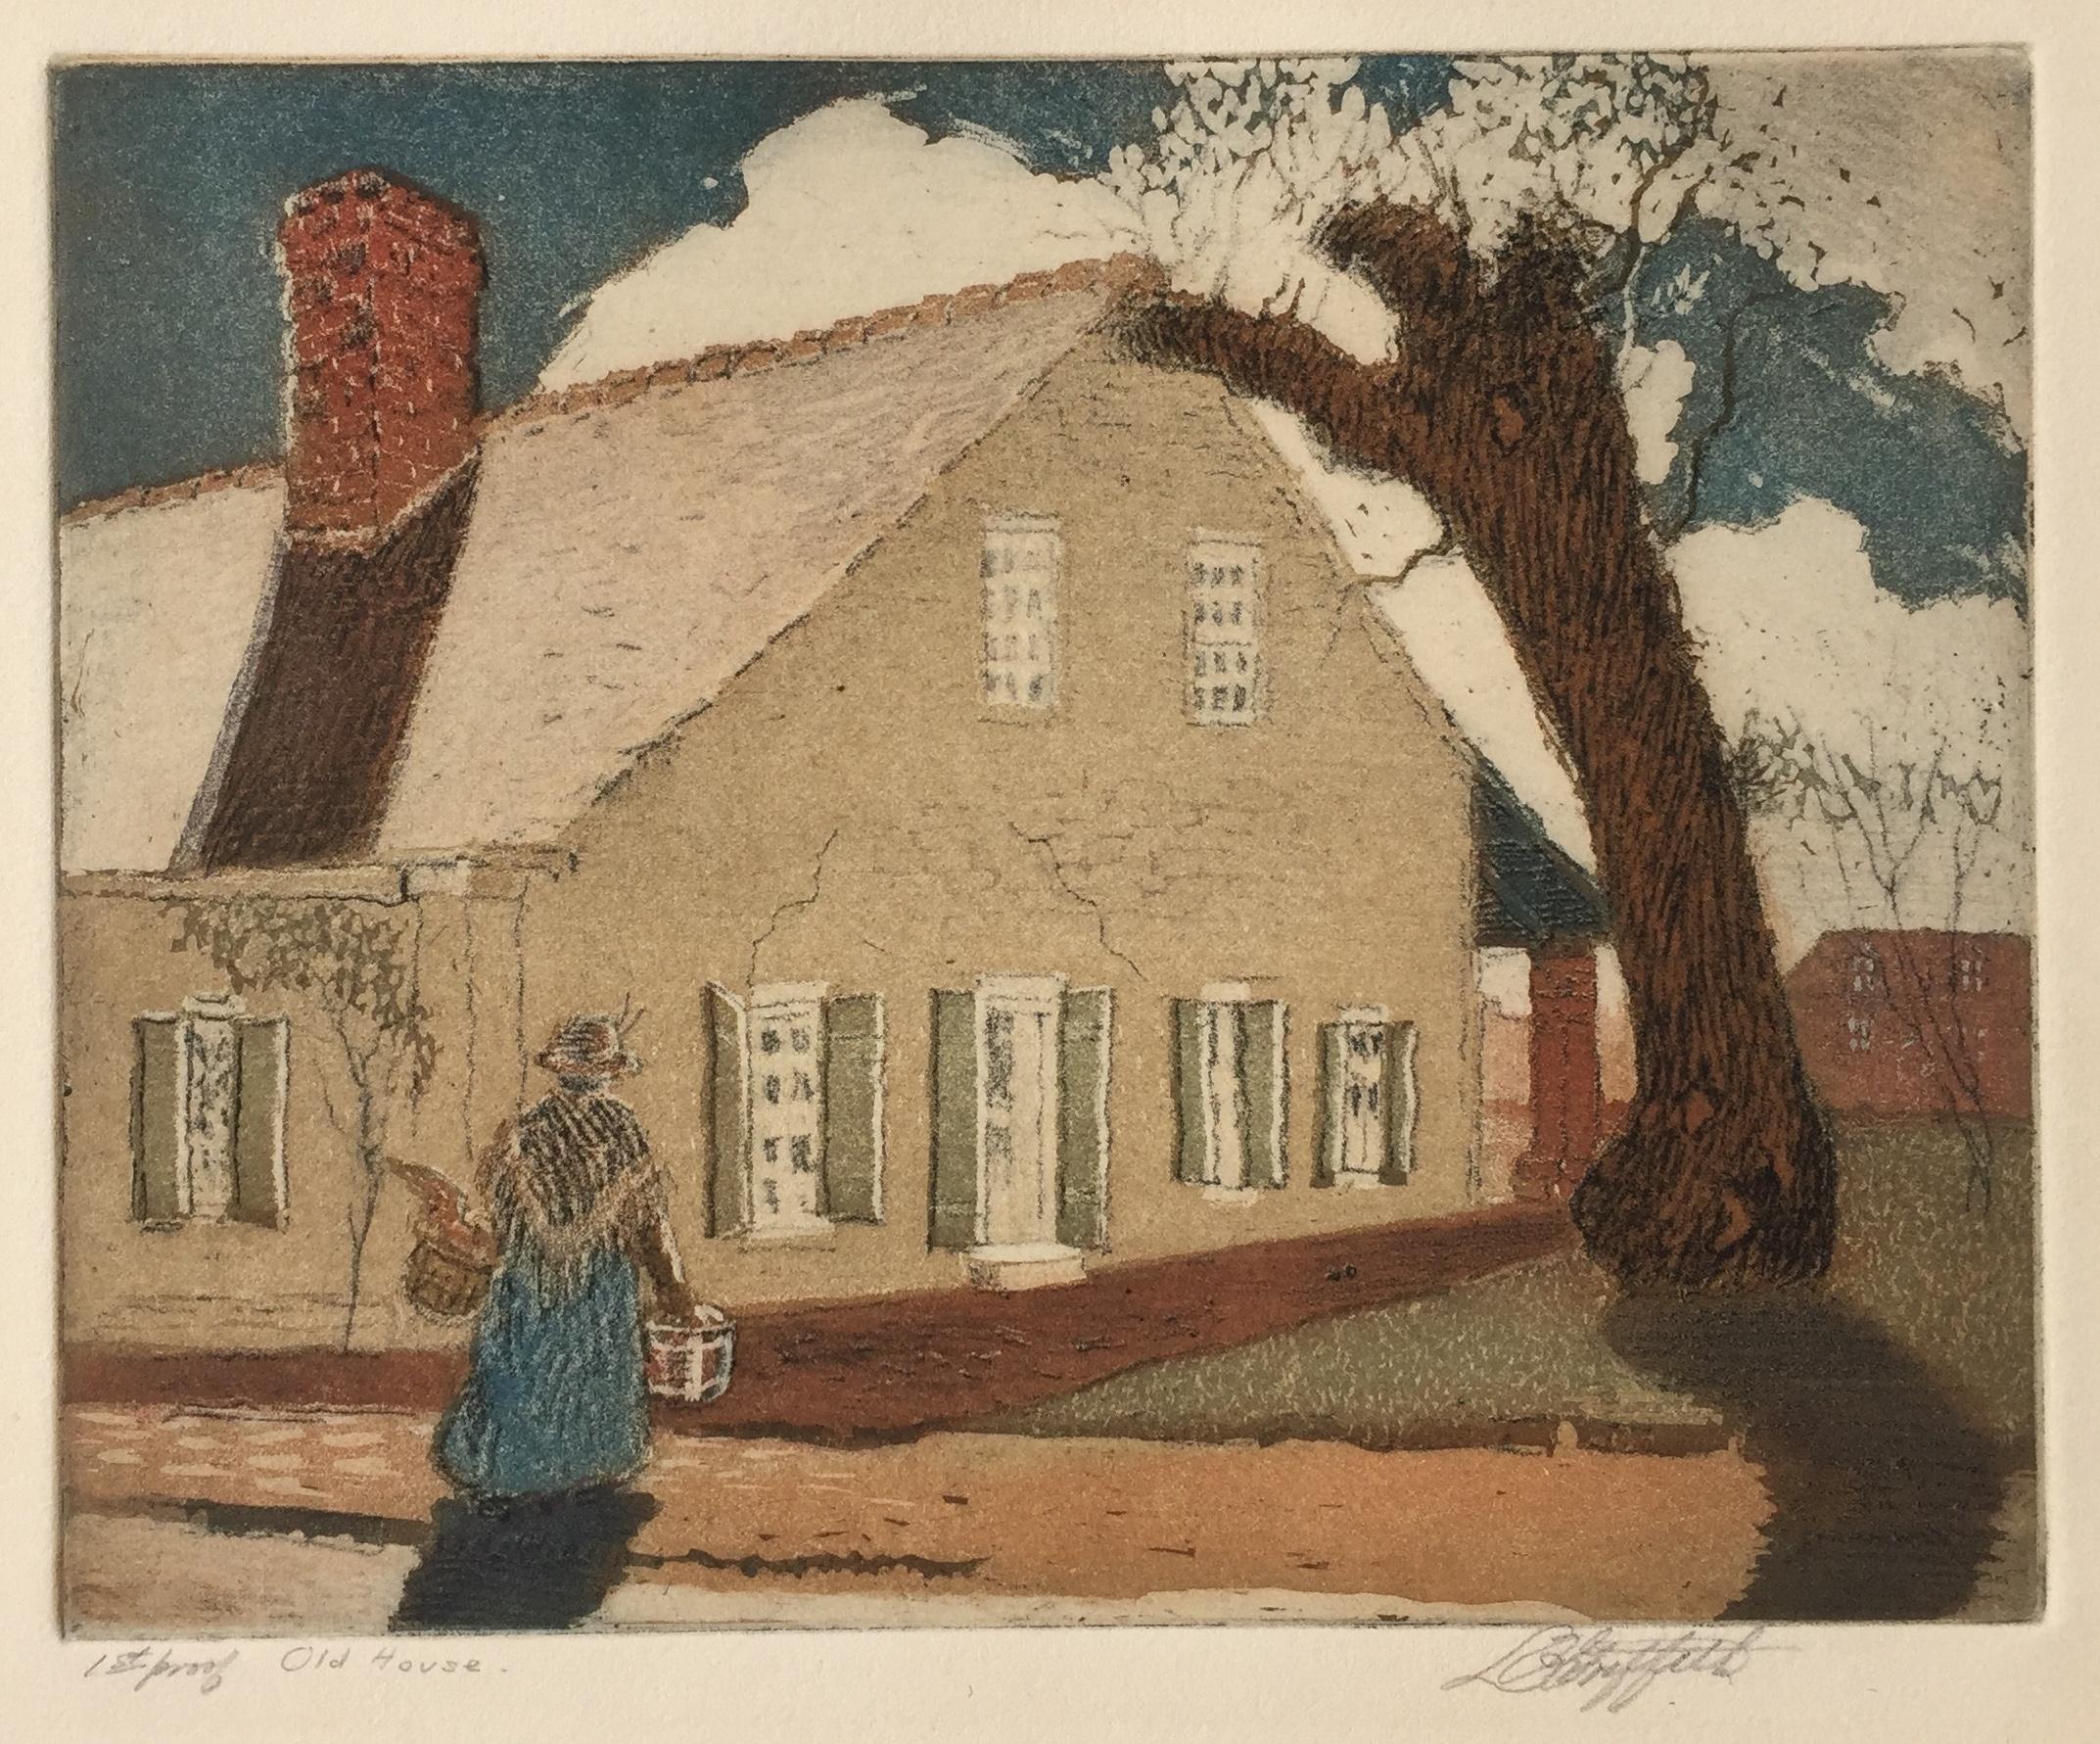 Old House, Mississippi